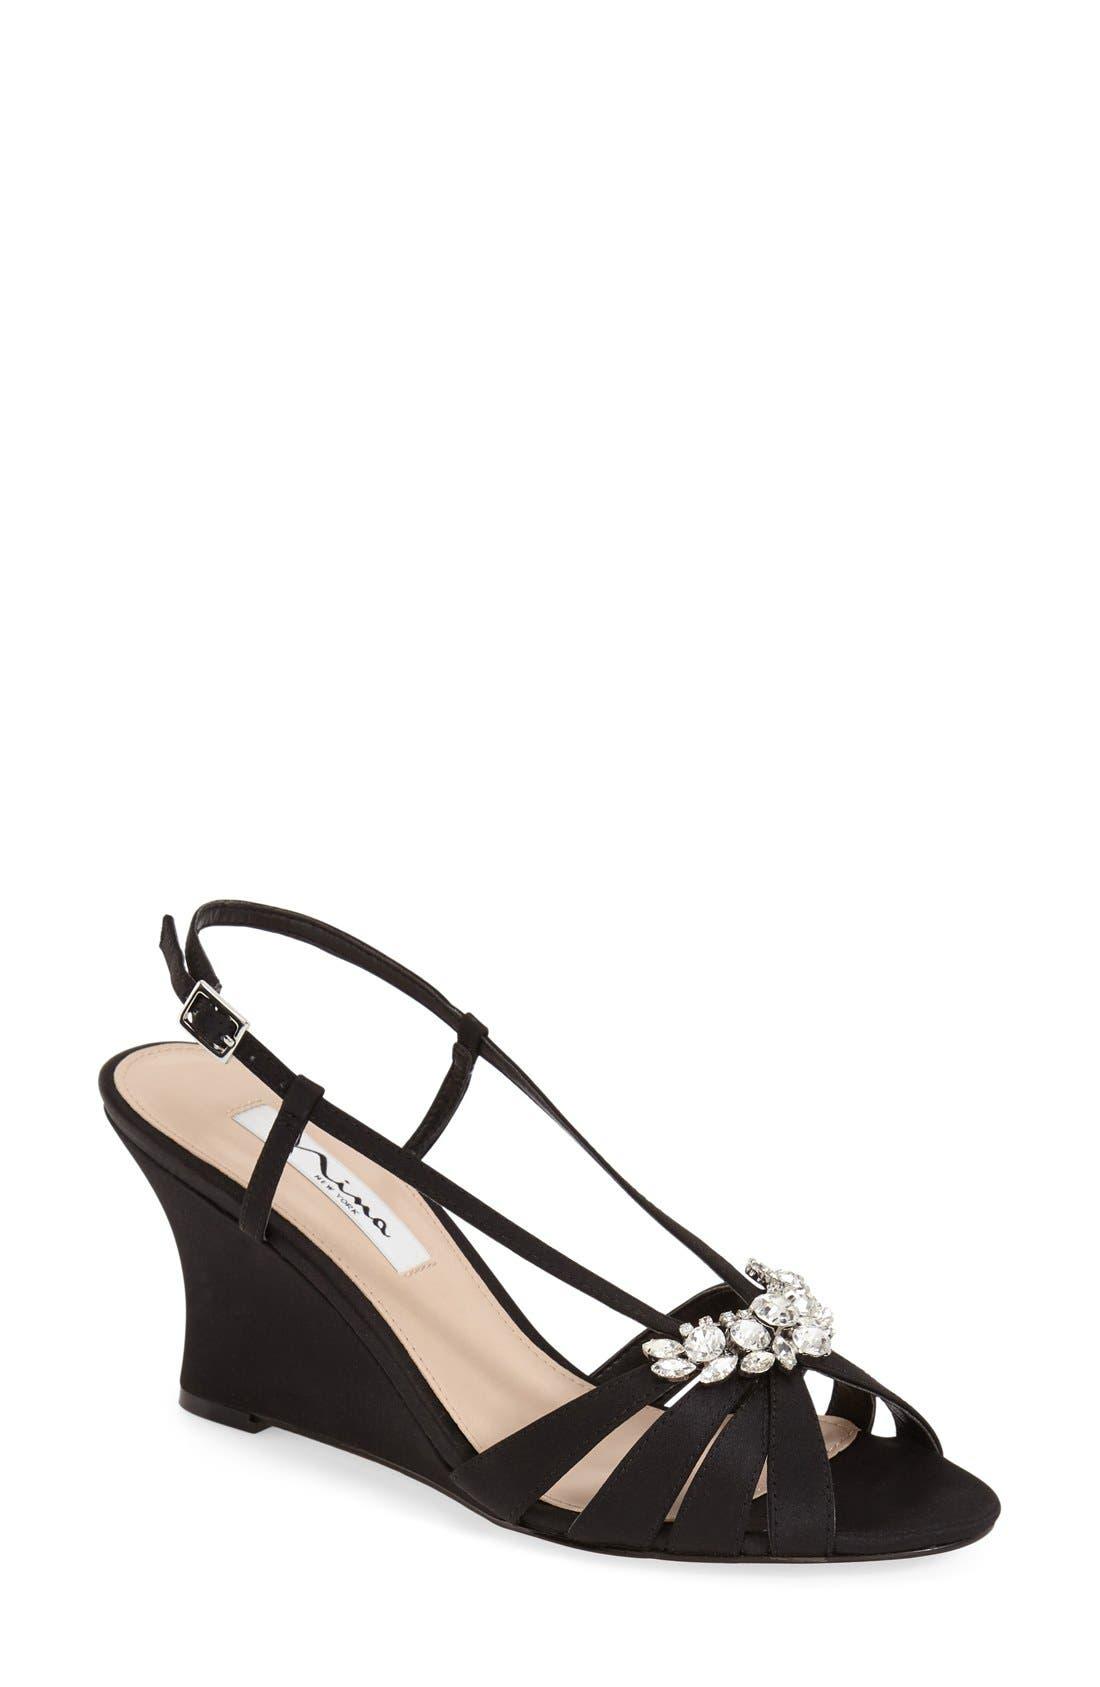 Main Image - Nina 'Voleta' Wedge Sandal (Women)